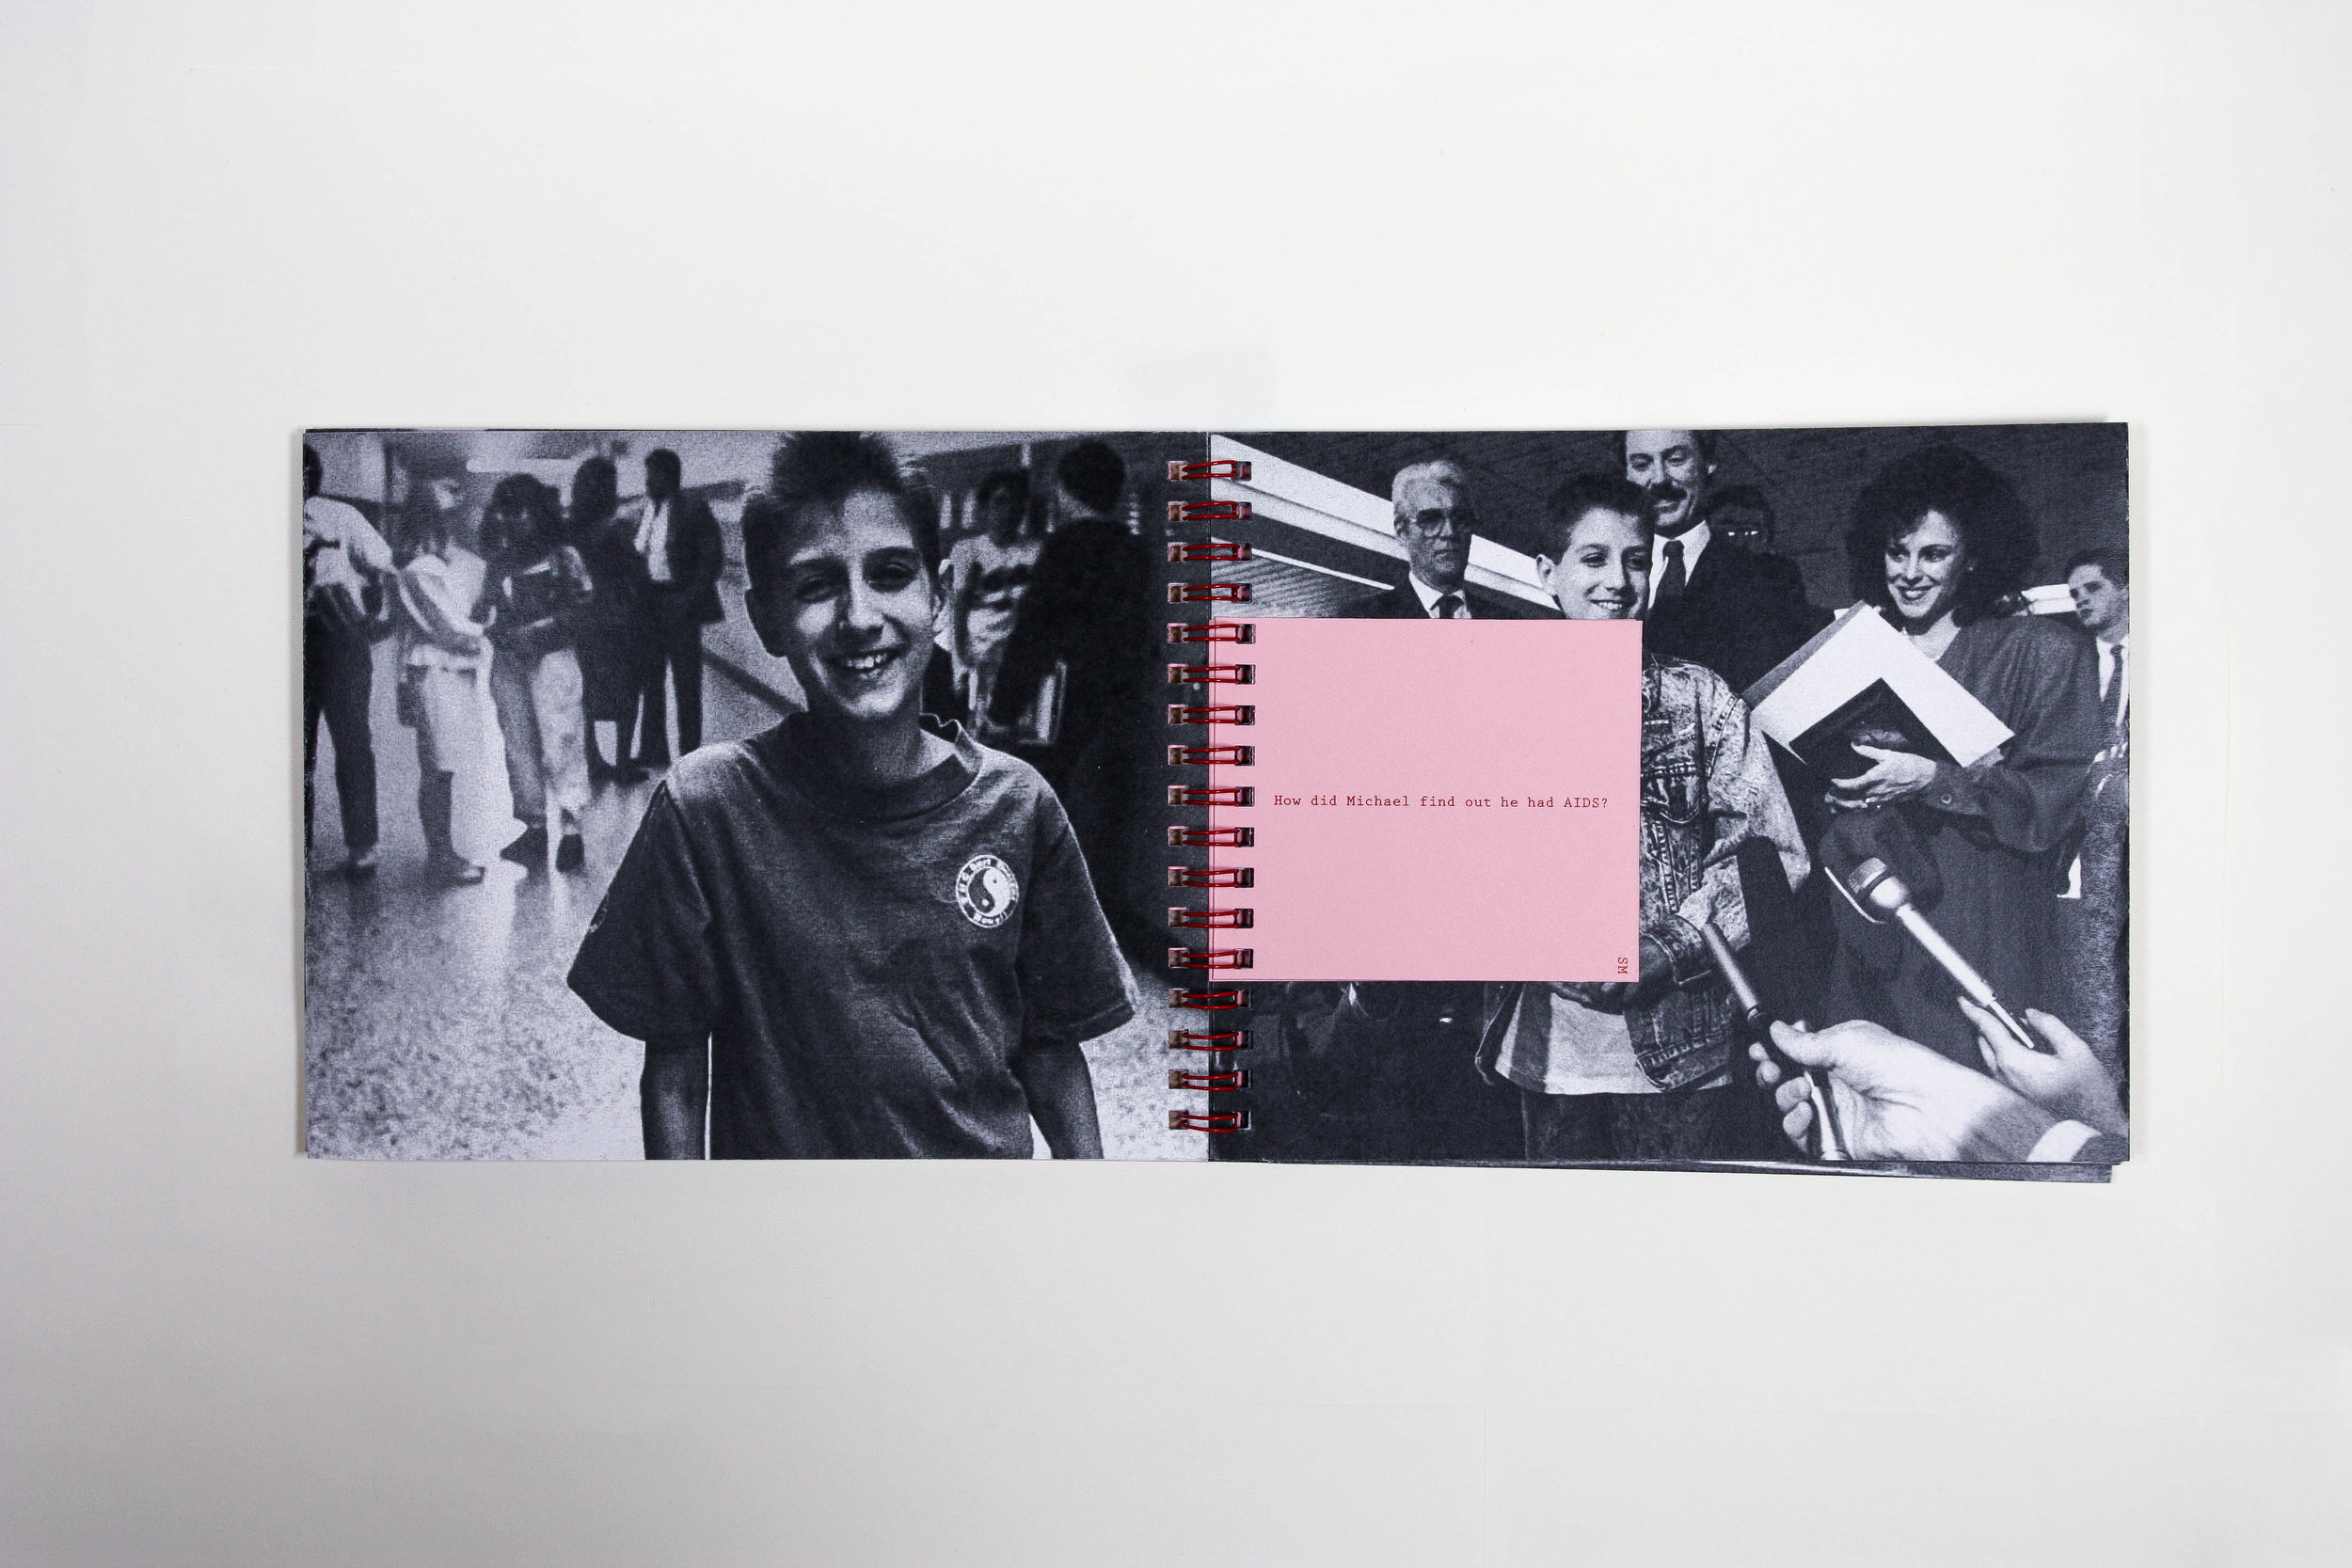 estory-bookimages-9.jpg